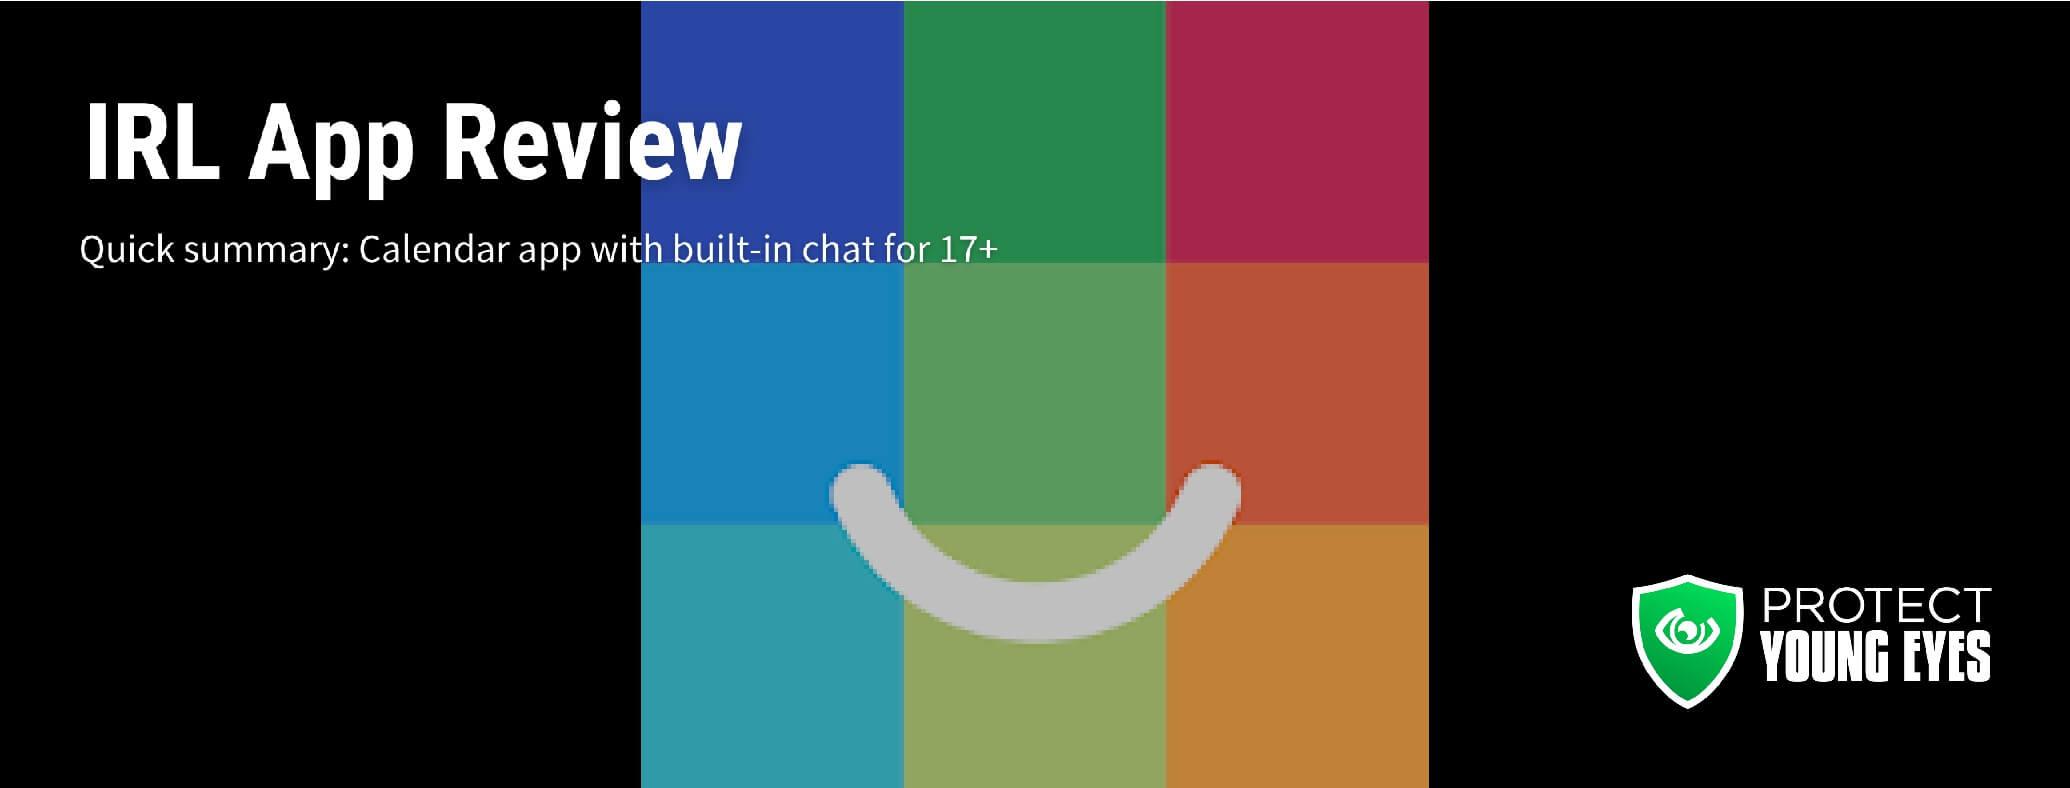 IRL App Review Header Image